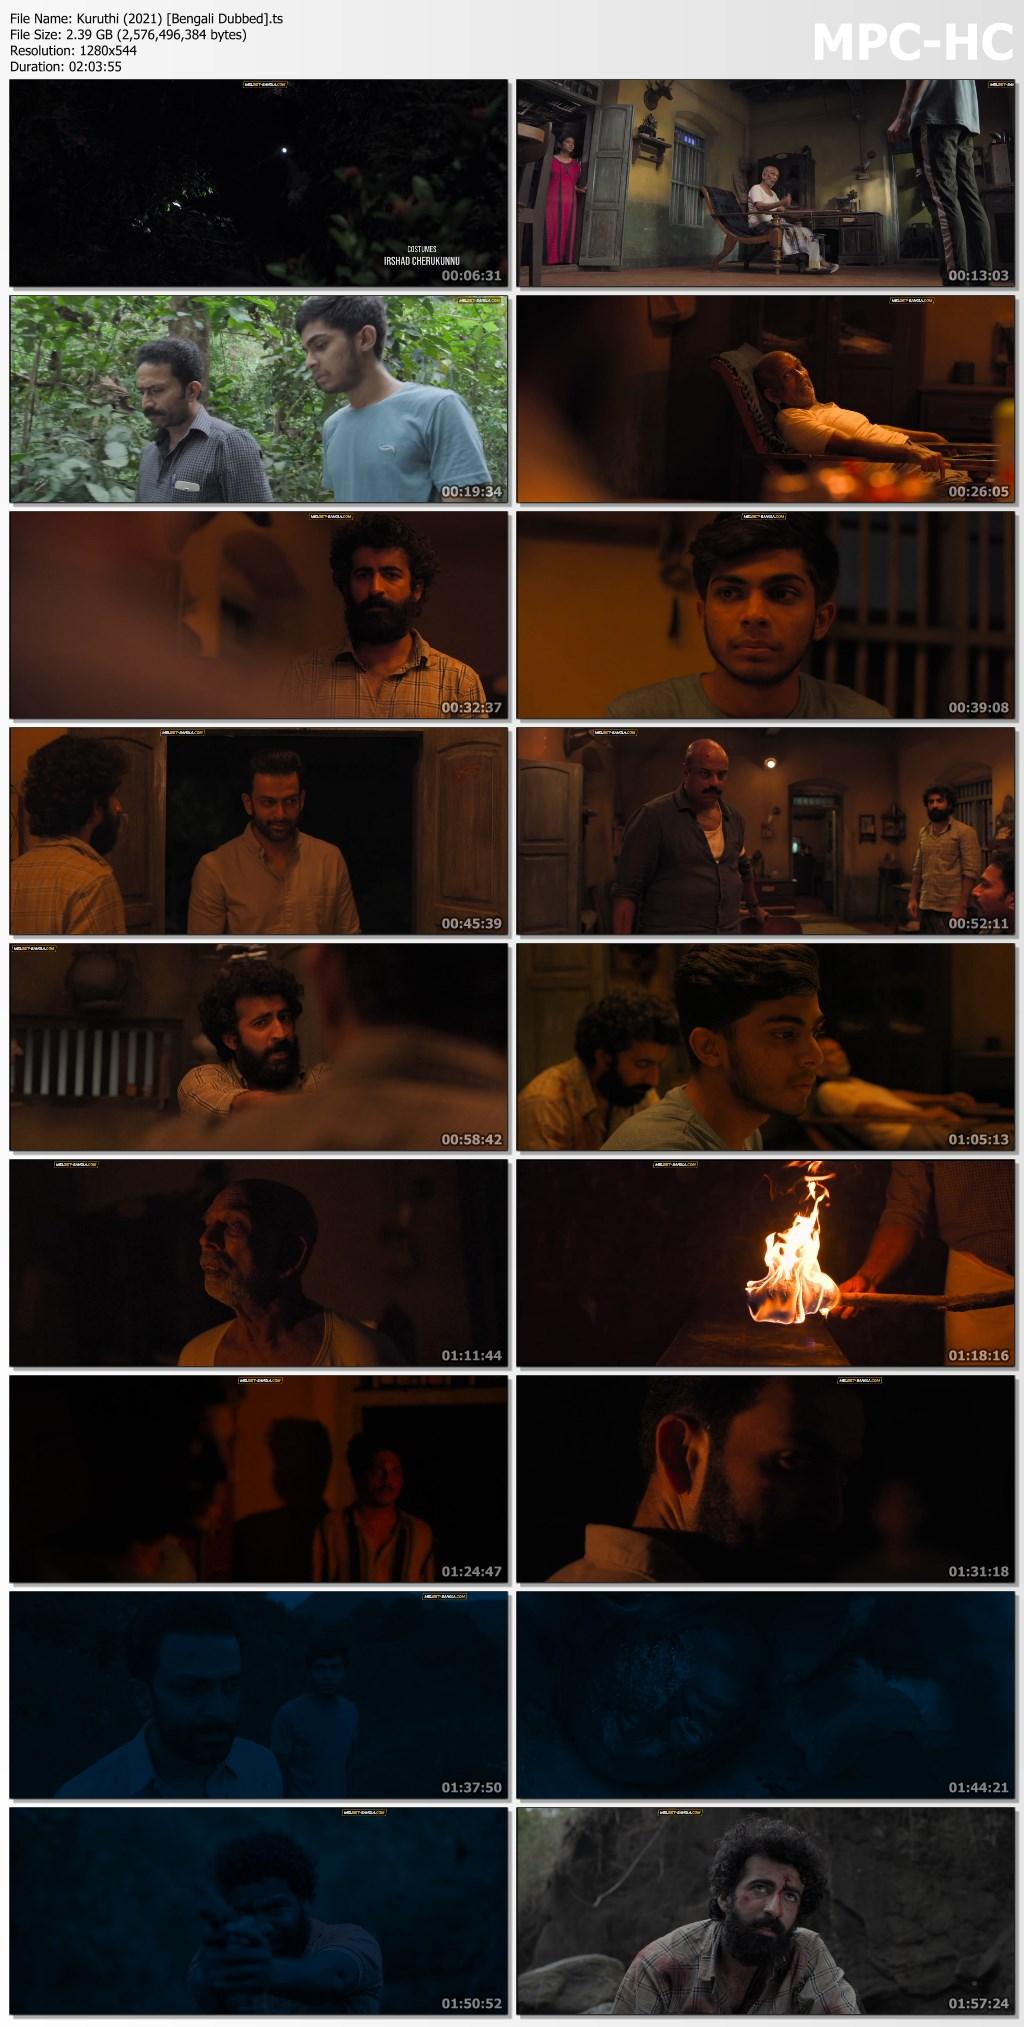 Kuruthi (2021) [Bengali Dubbed].ts thumbs